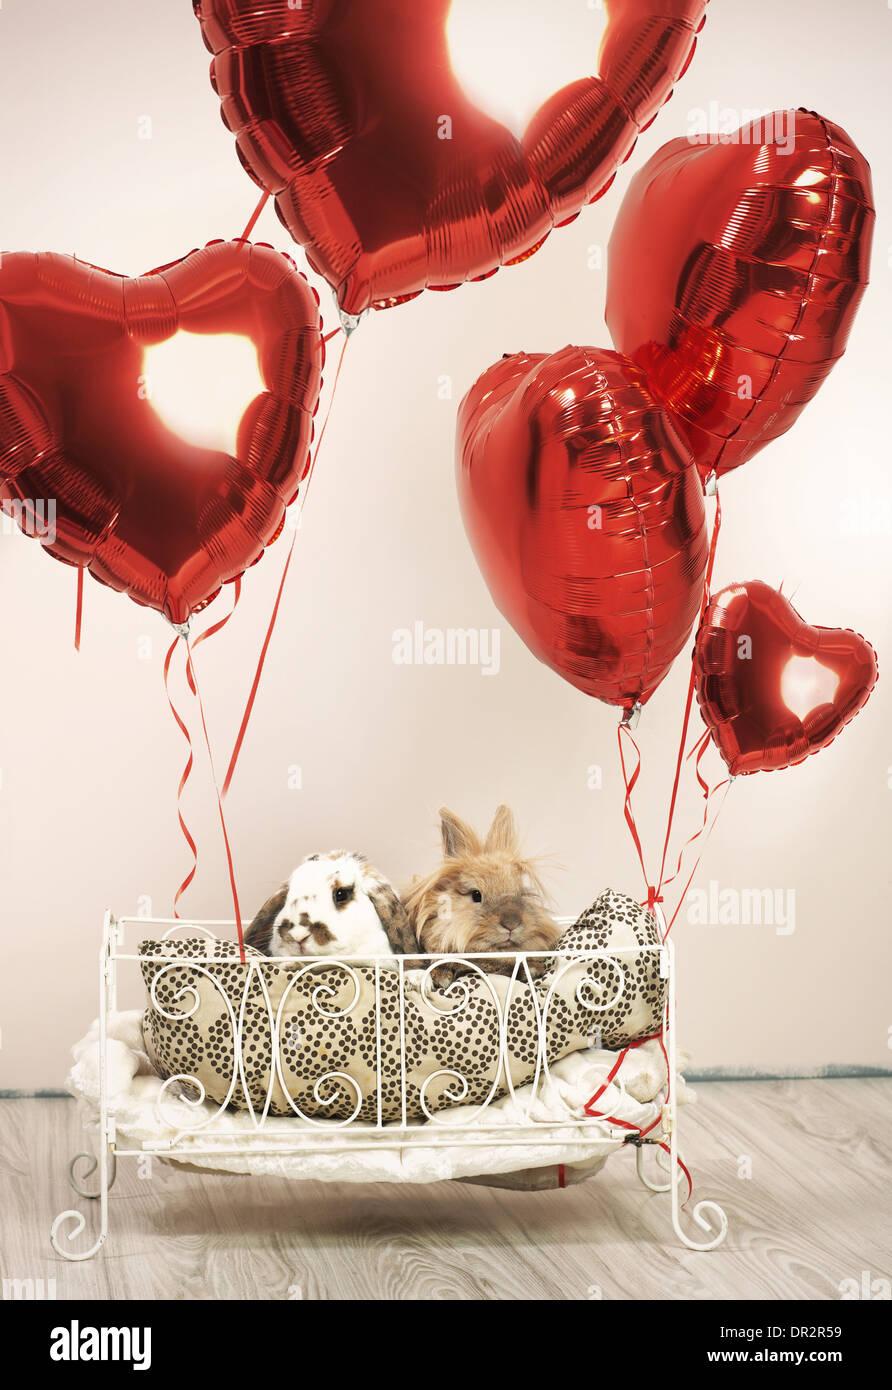 Zwei Kaninchen in Valentins Szene mit Luftballons Stockbild